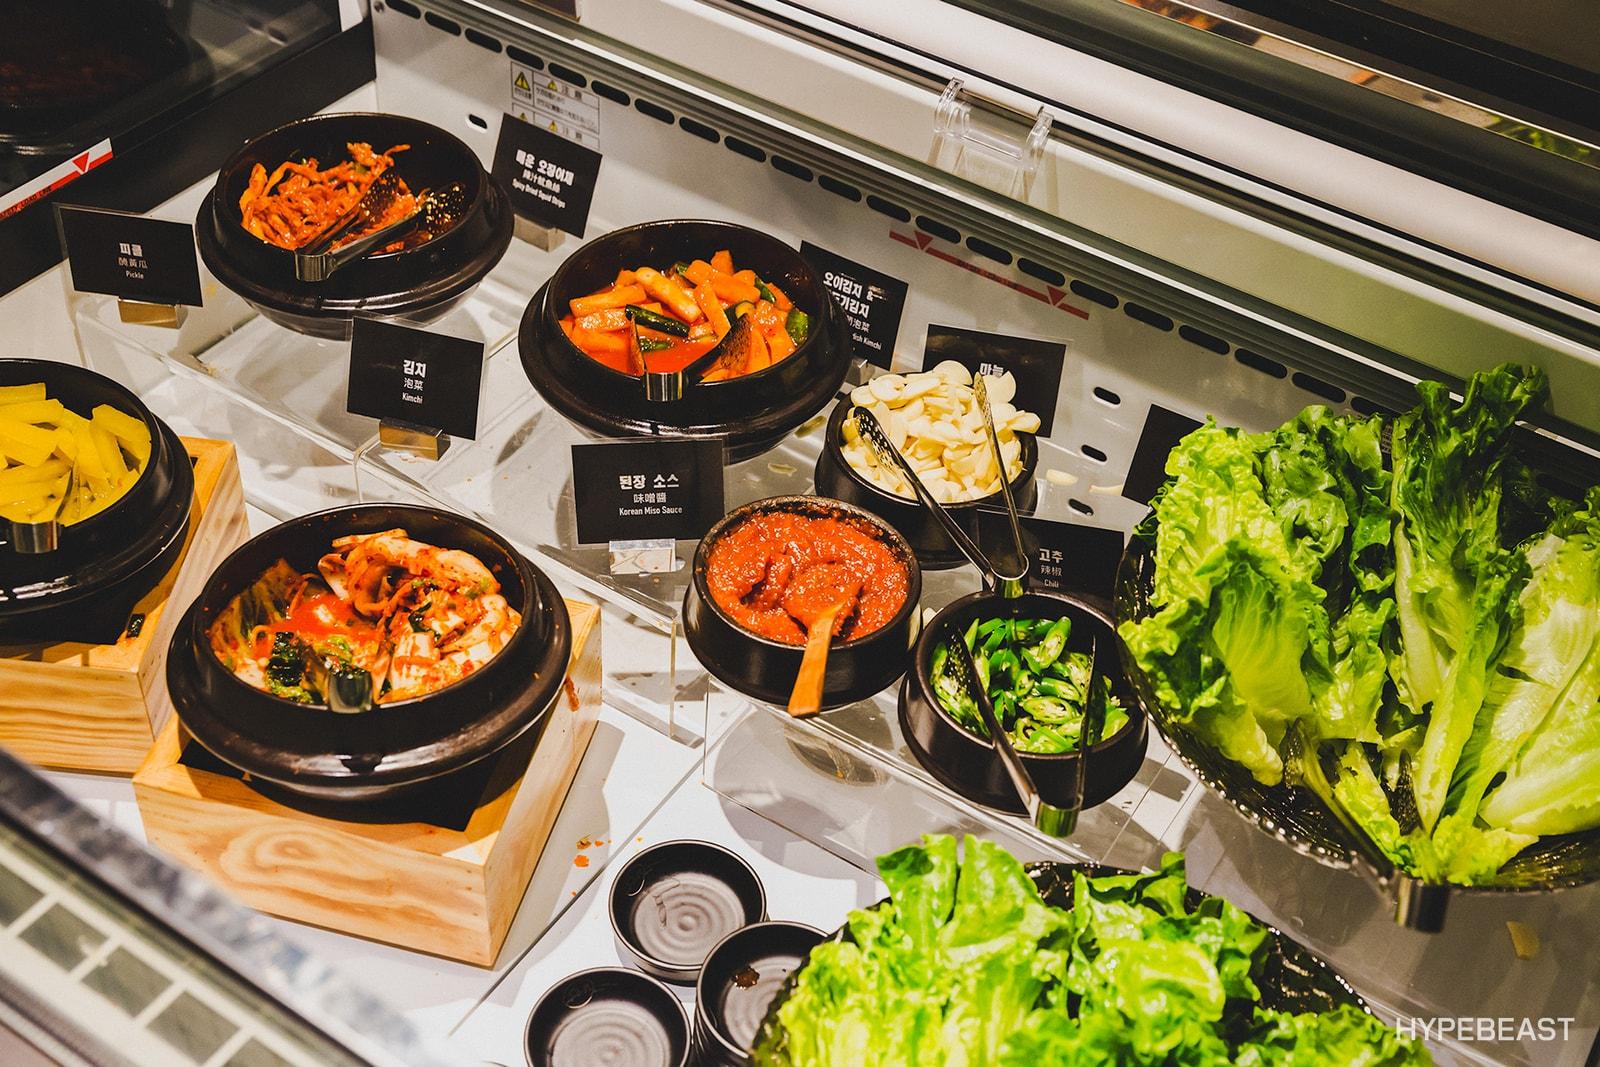 HYPEBEAST Eats... 韓國國民美食鐵板雞專門店「柳氏家」登陸香港